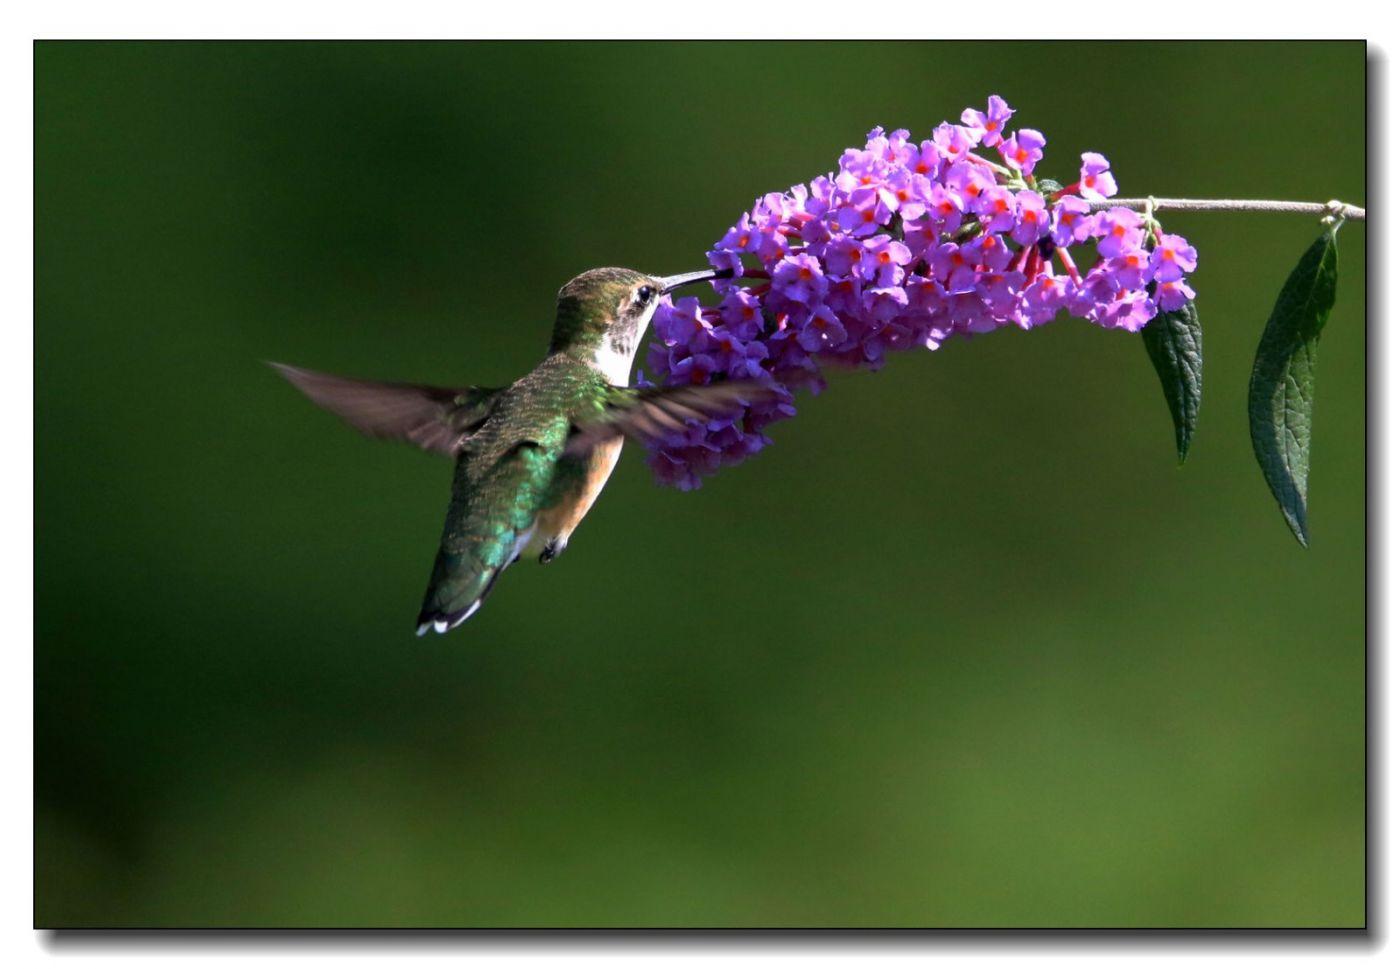 蜂鸟组图(五)_图1-6